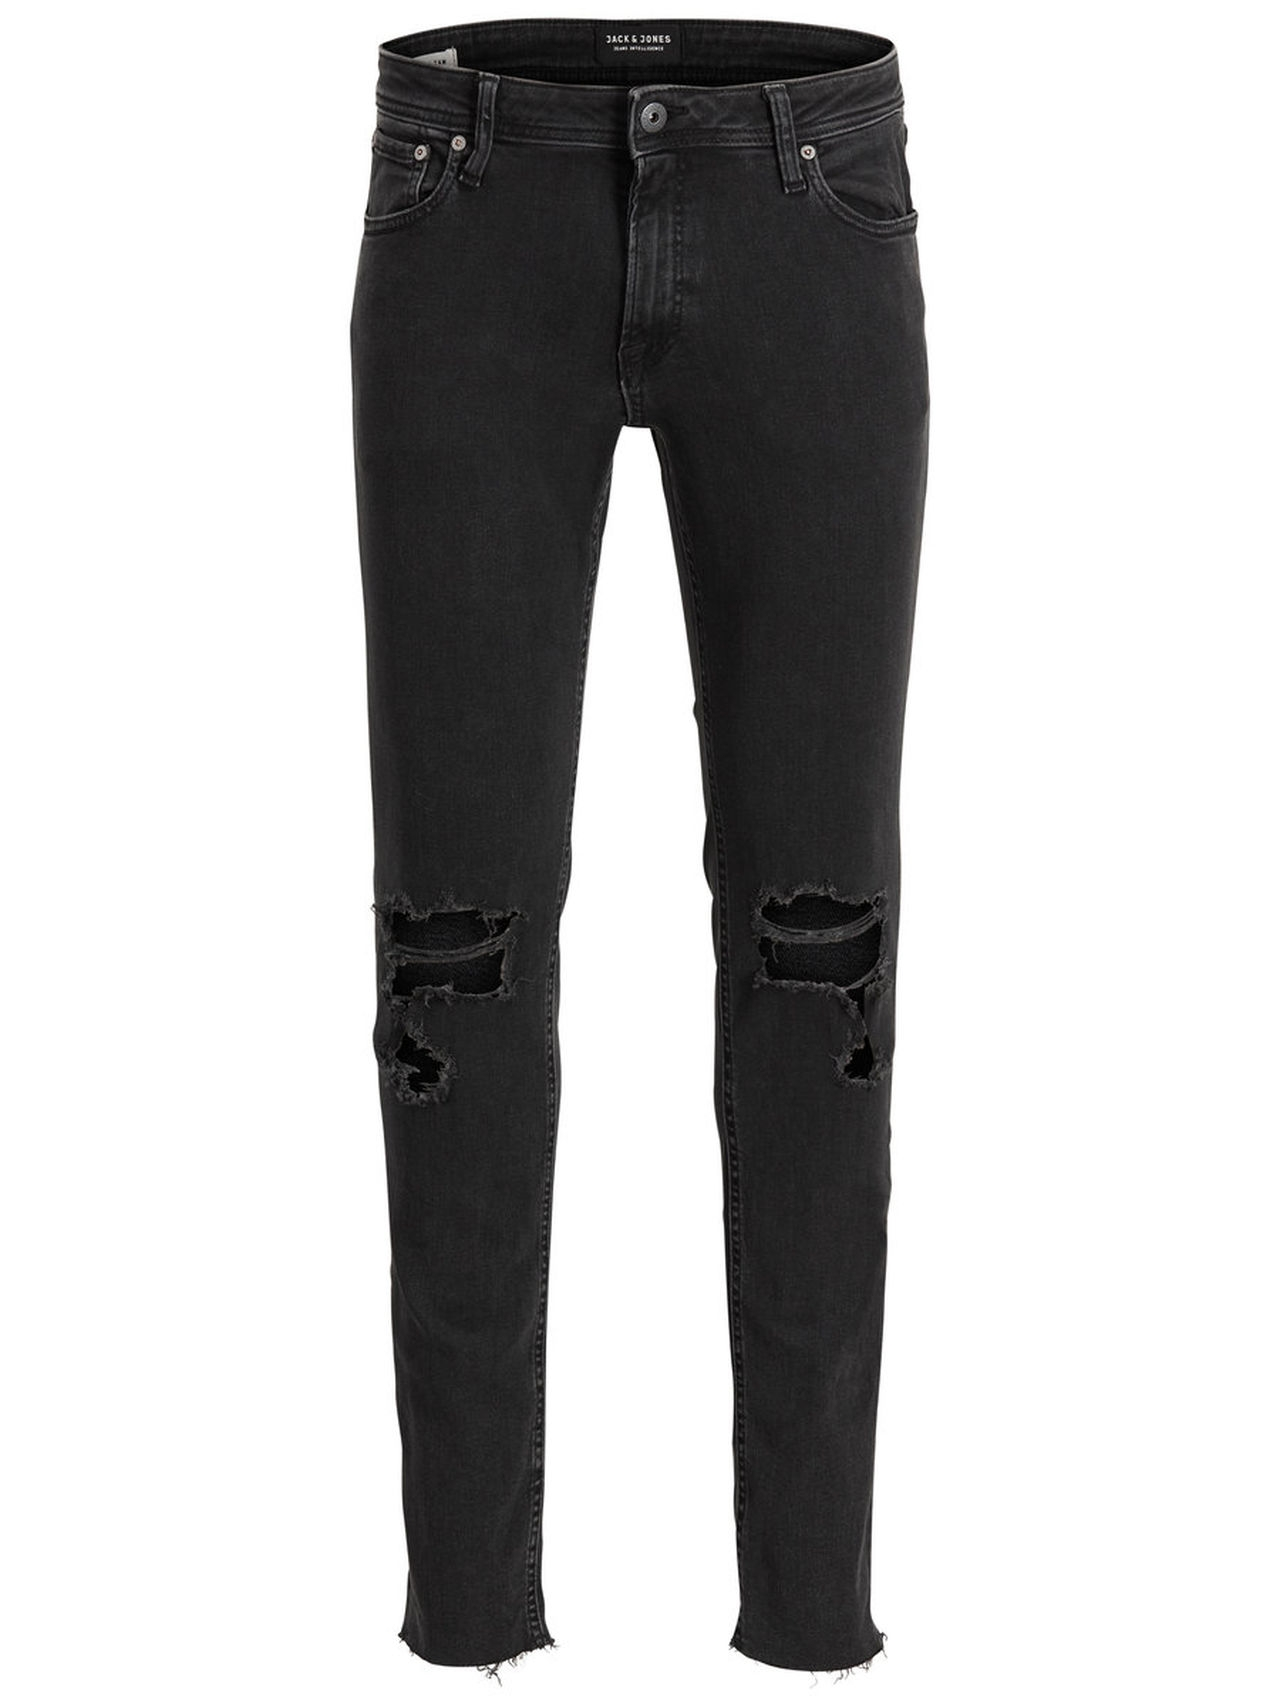 JACK & JONES Liam Original Am 729 Skinny Fit Jeans Man Grå